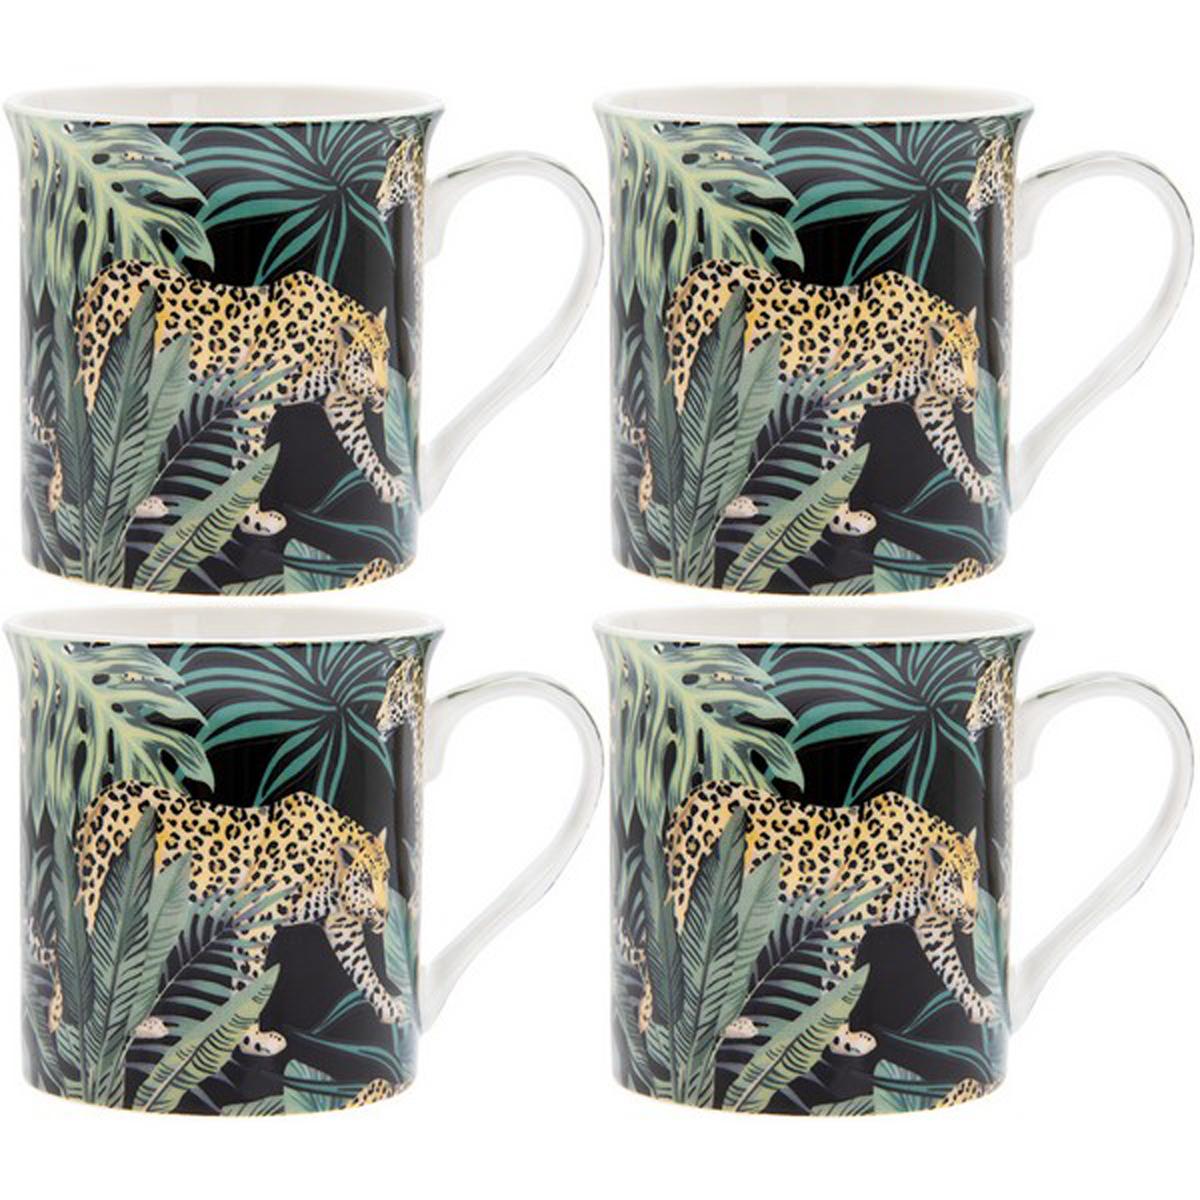 Coffret mugs porcelaine \'Jungle Fever\' vert noir (4 mugs) - 85x85 mm (léopard) - [R0473]